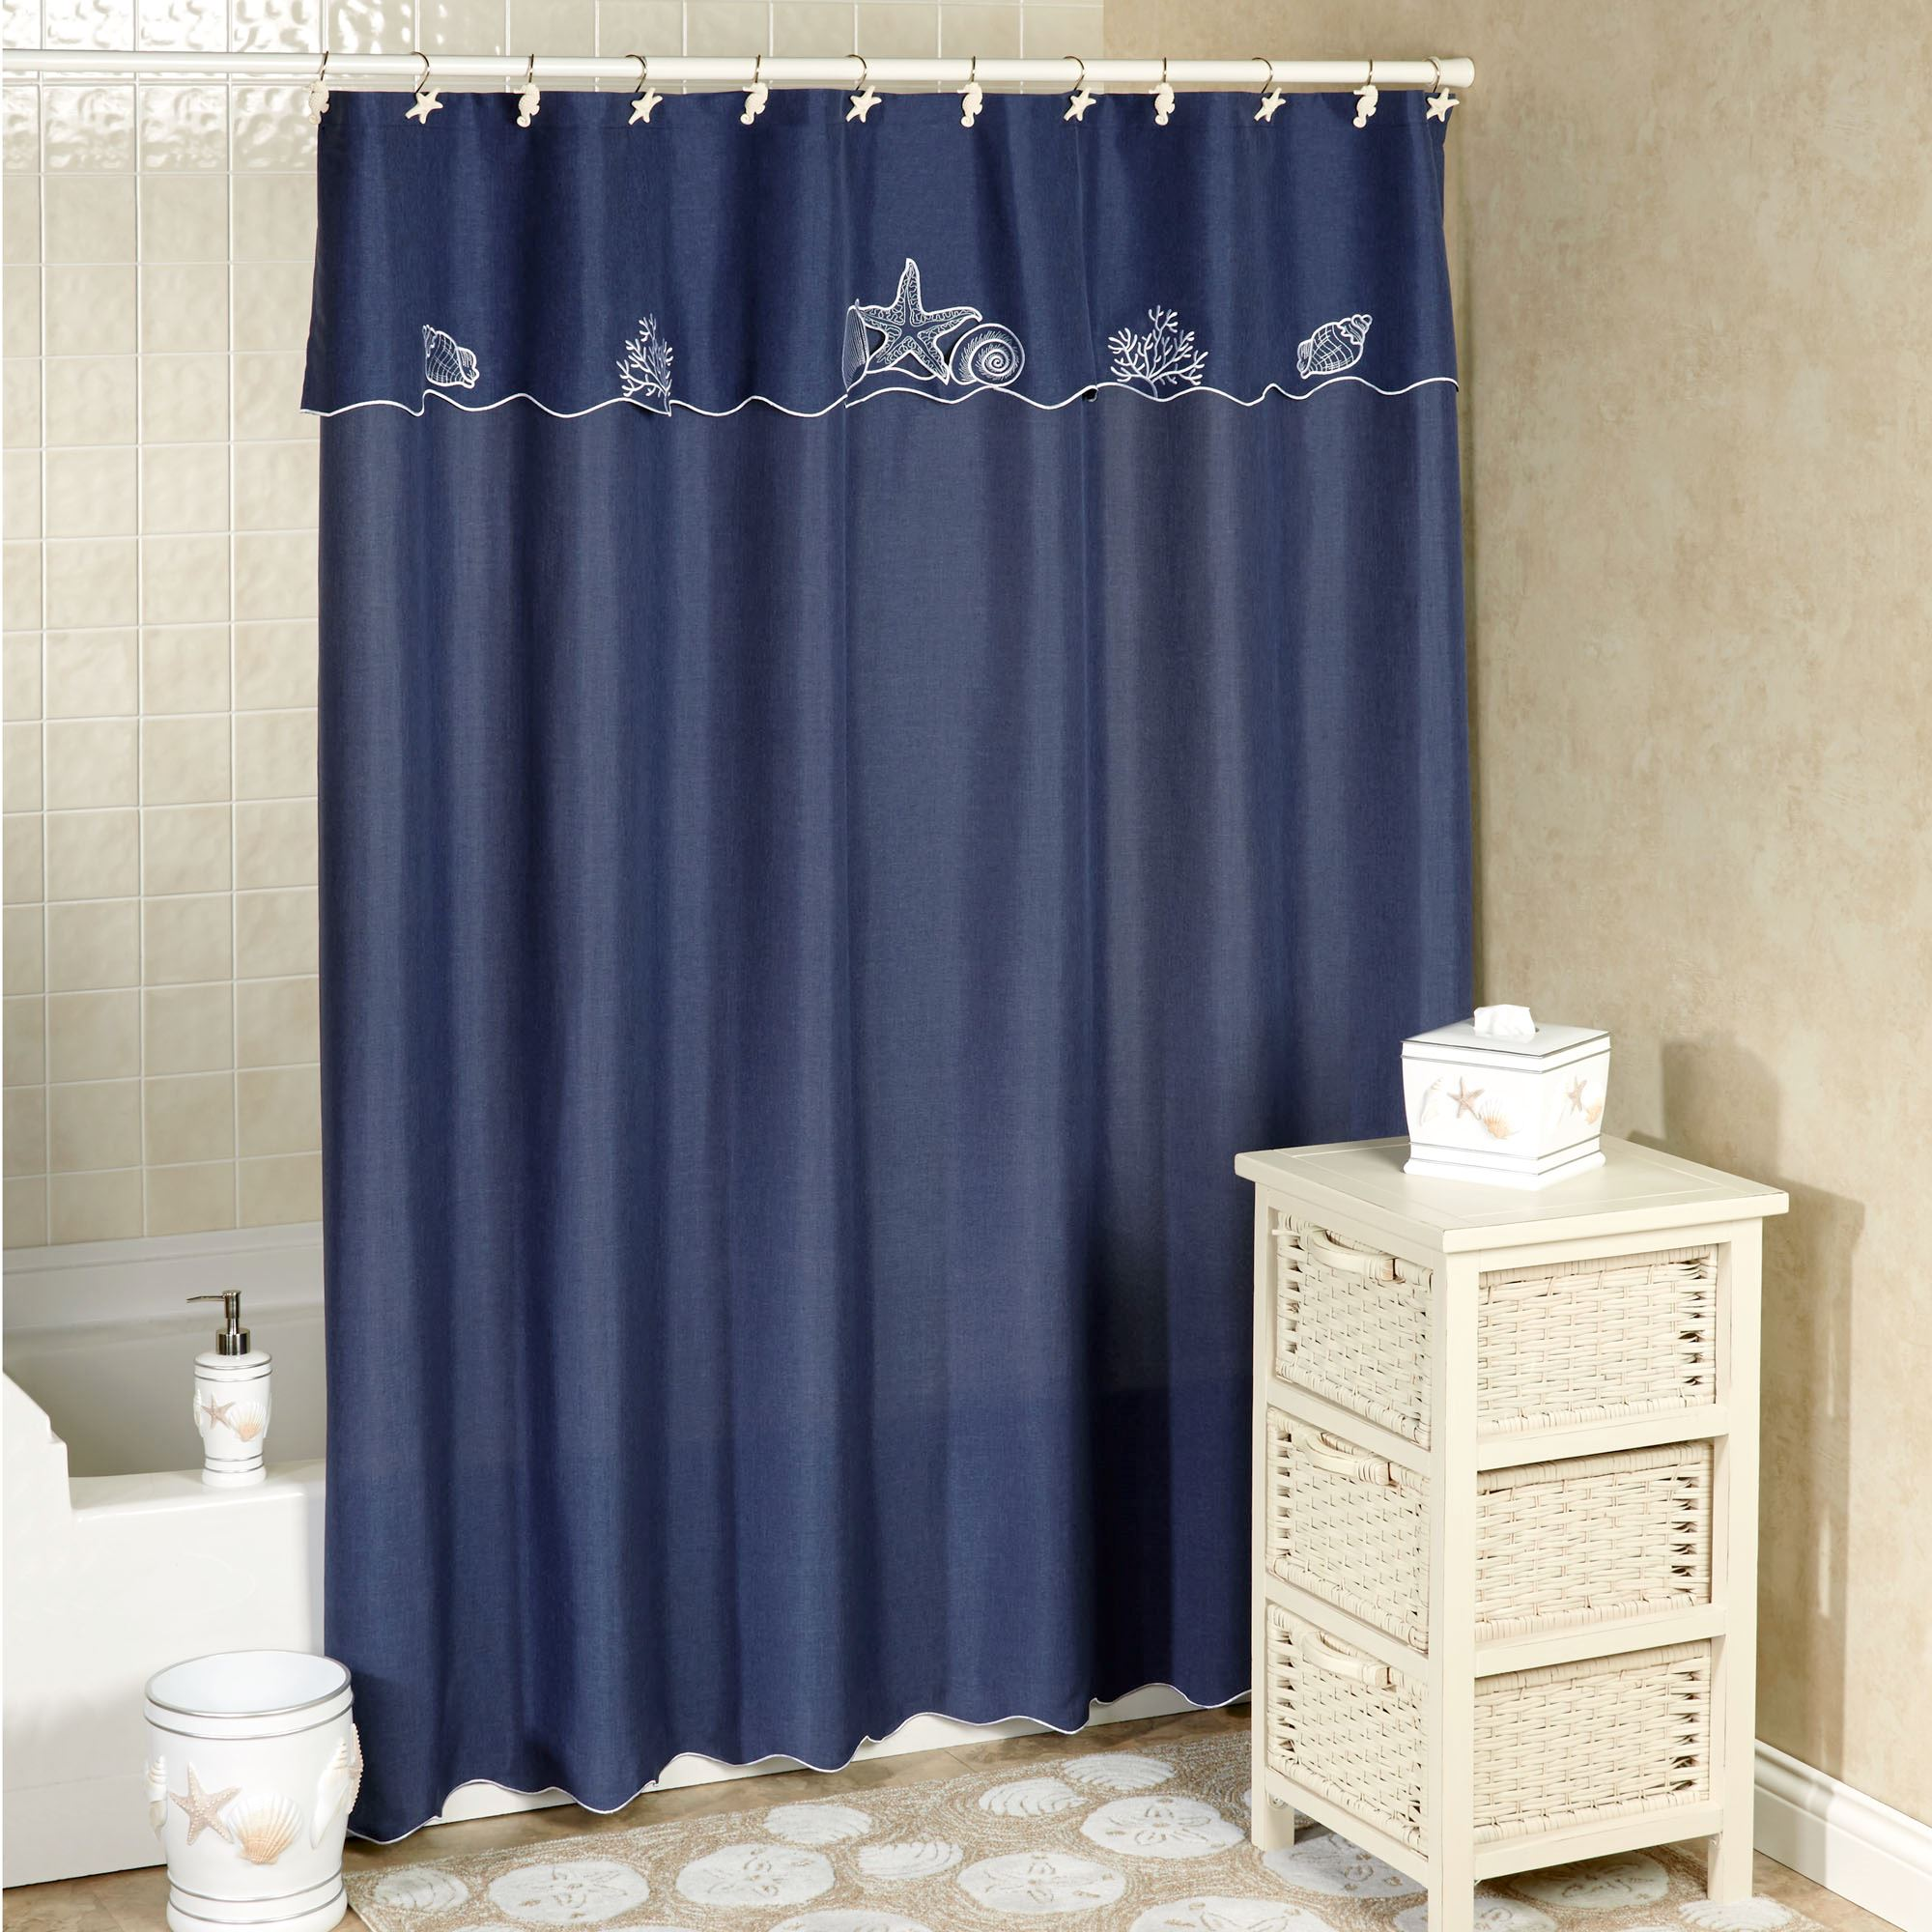 Sanibel Indigo Blue Coastal Shower Curtain